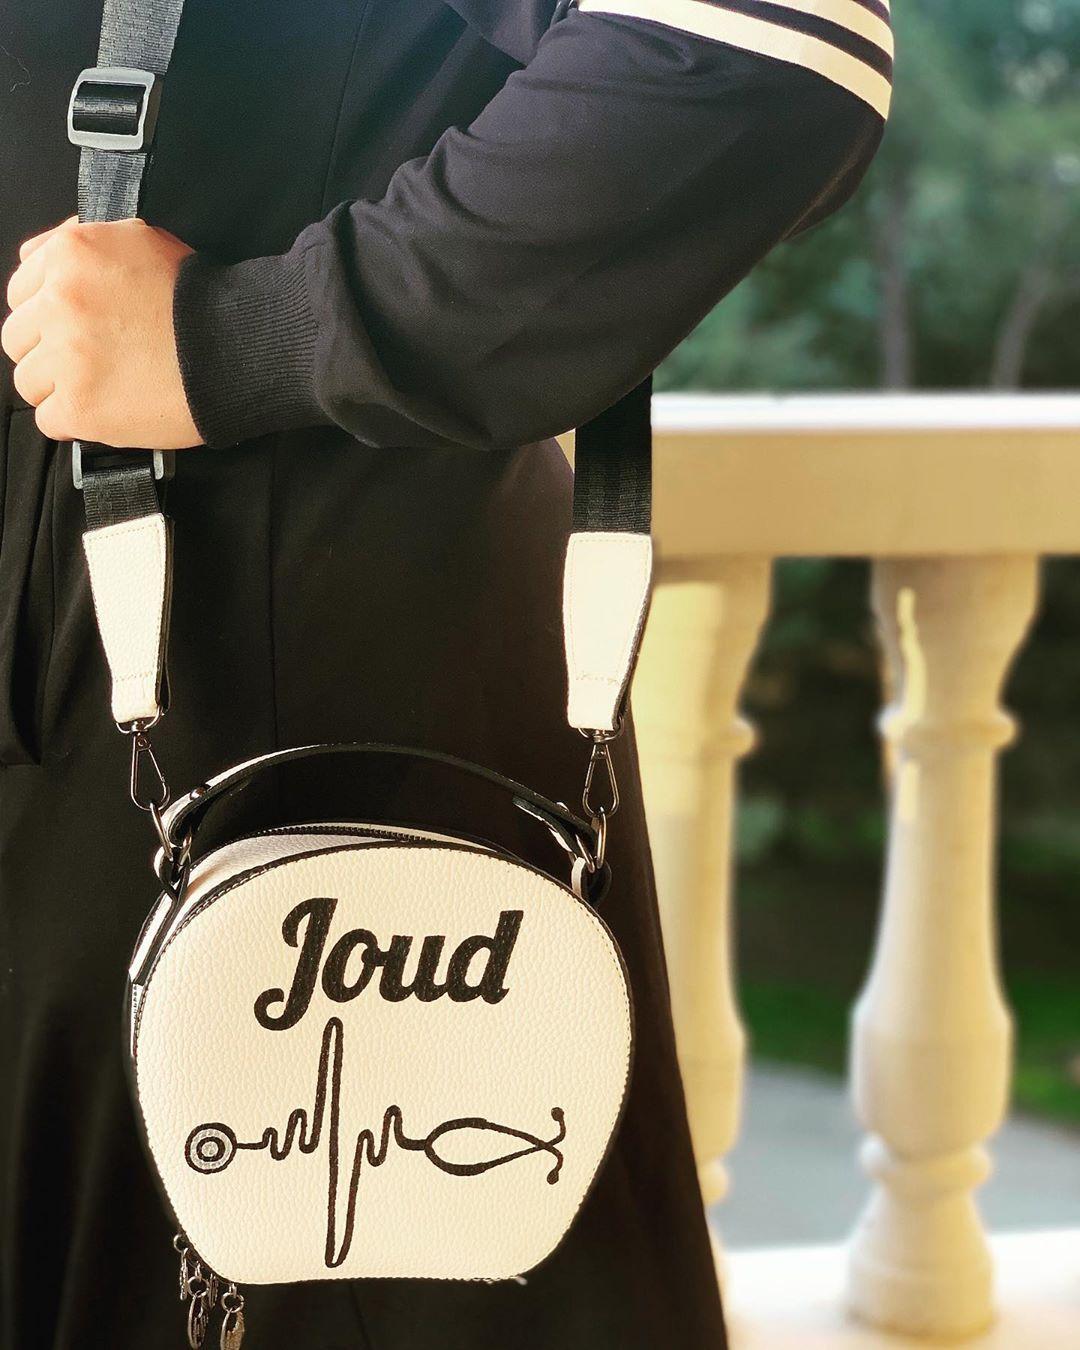 Spore Chic Shoulder Bag Joud Aboultaif لأحلى ممرضة بالعالم جود اسماء هدايا صيدلانية Chanel Deauville Tote Bag Tote Bag Bags